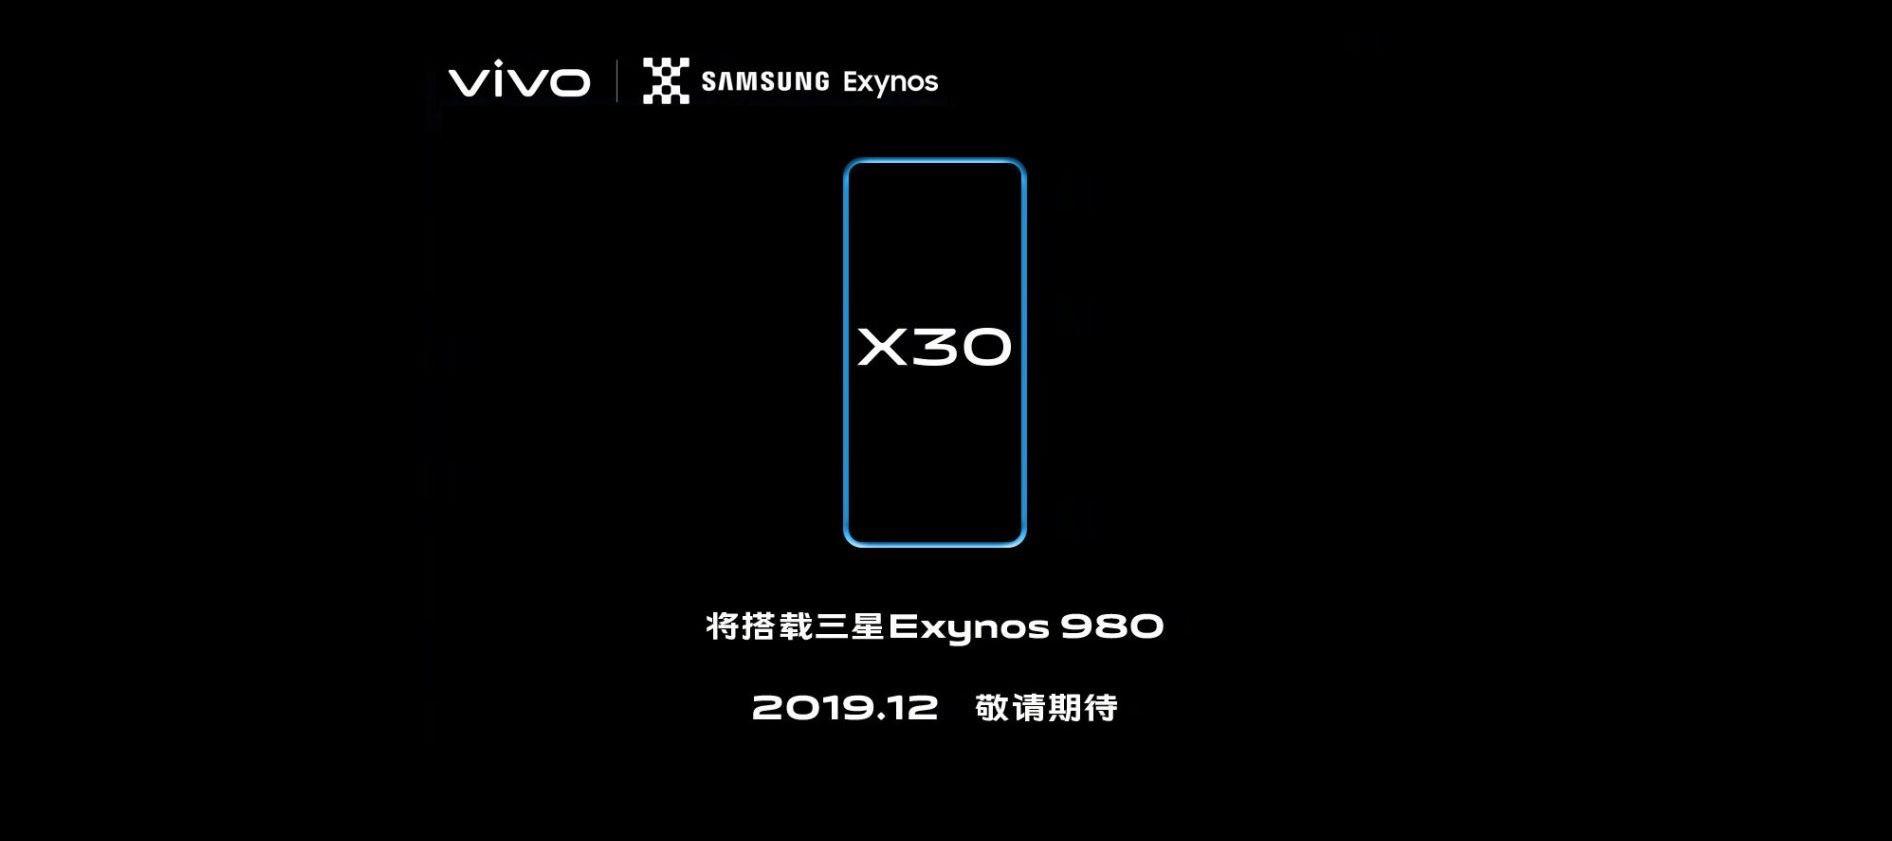 vivo-x30-pro-price-specs-release-date-availability